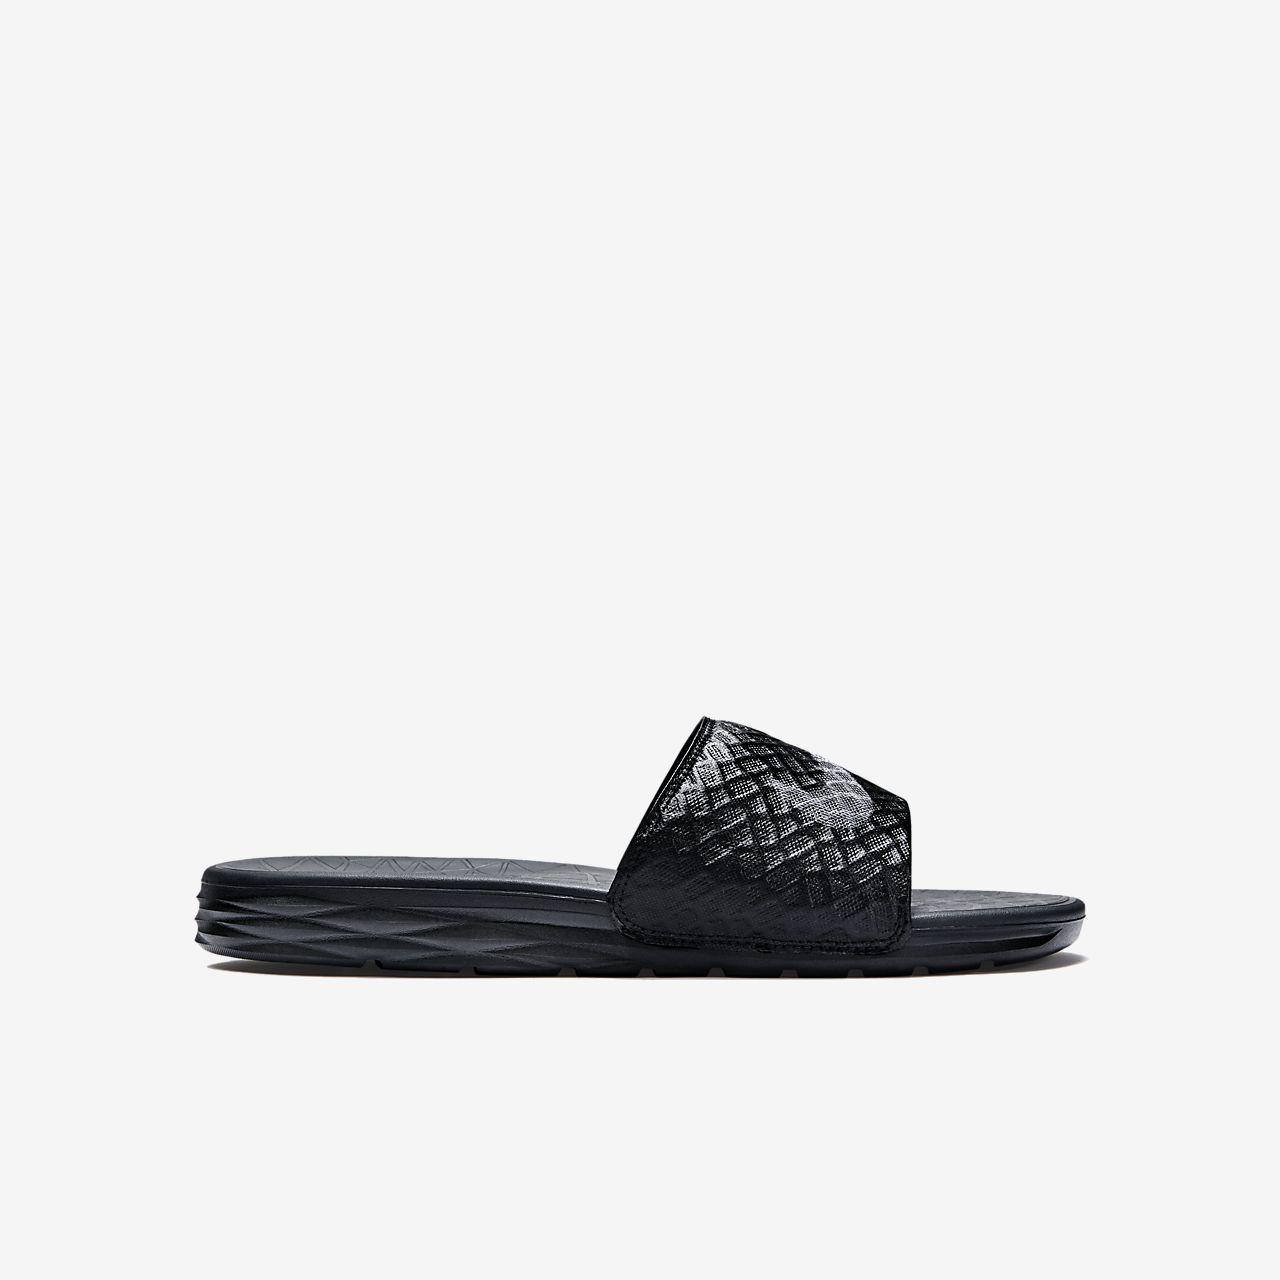 493926676ea9 Low Resolution Nike Benassi Solarsoft 2 Men s Slide Nike Benassi Solarsoft  2 Men s Slide